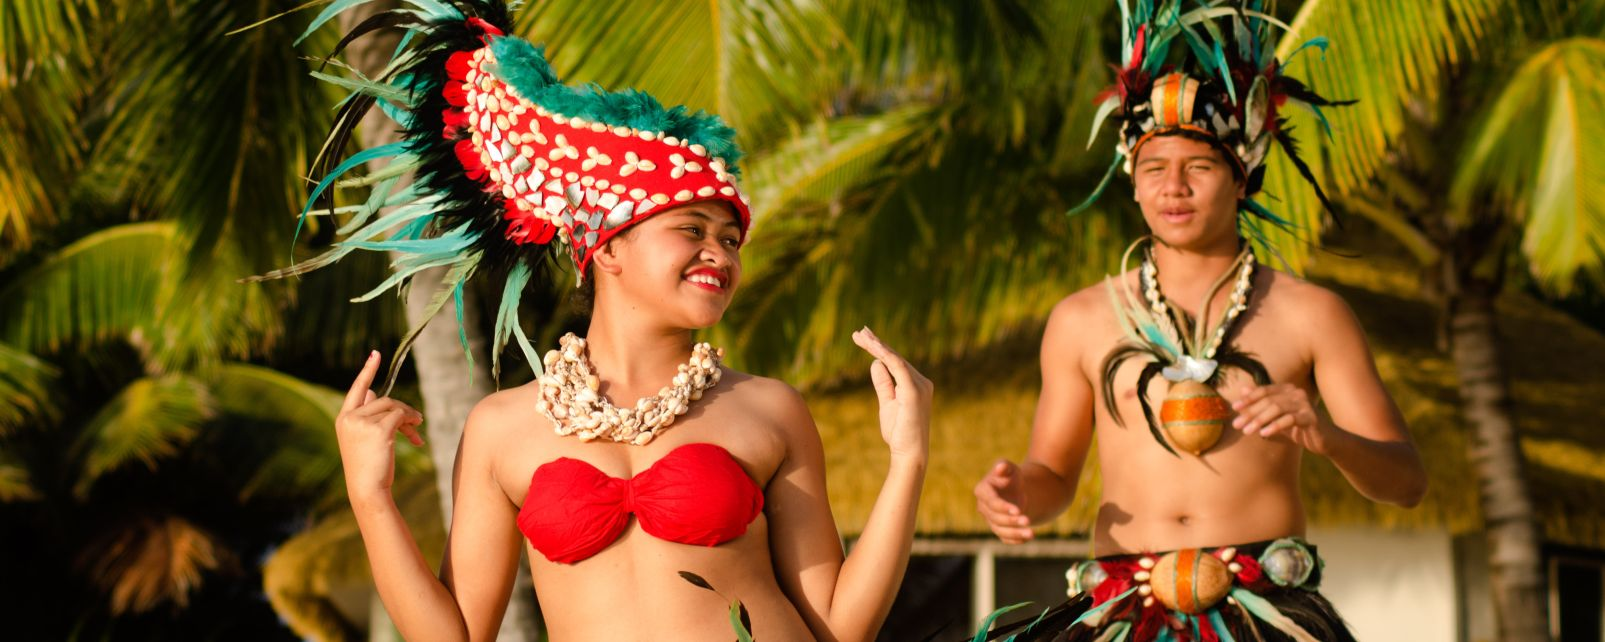 Les arts et la culture, Cook Islands, Polynesian, Rarotonga, cook islanders, Pacifique, danse, polynésie